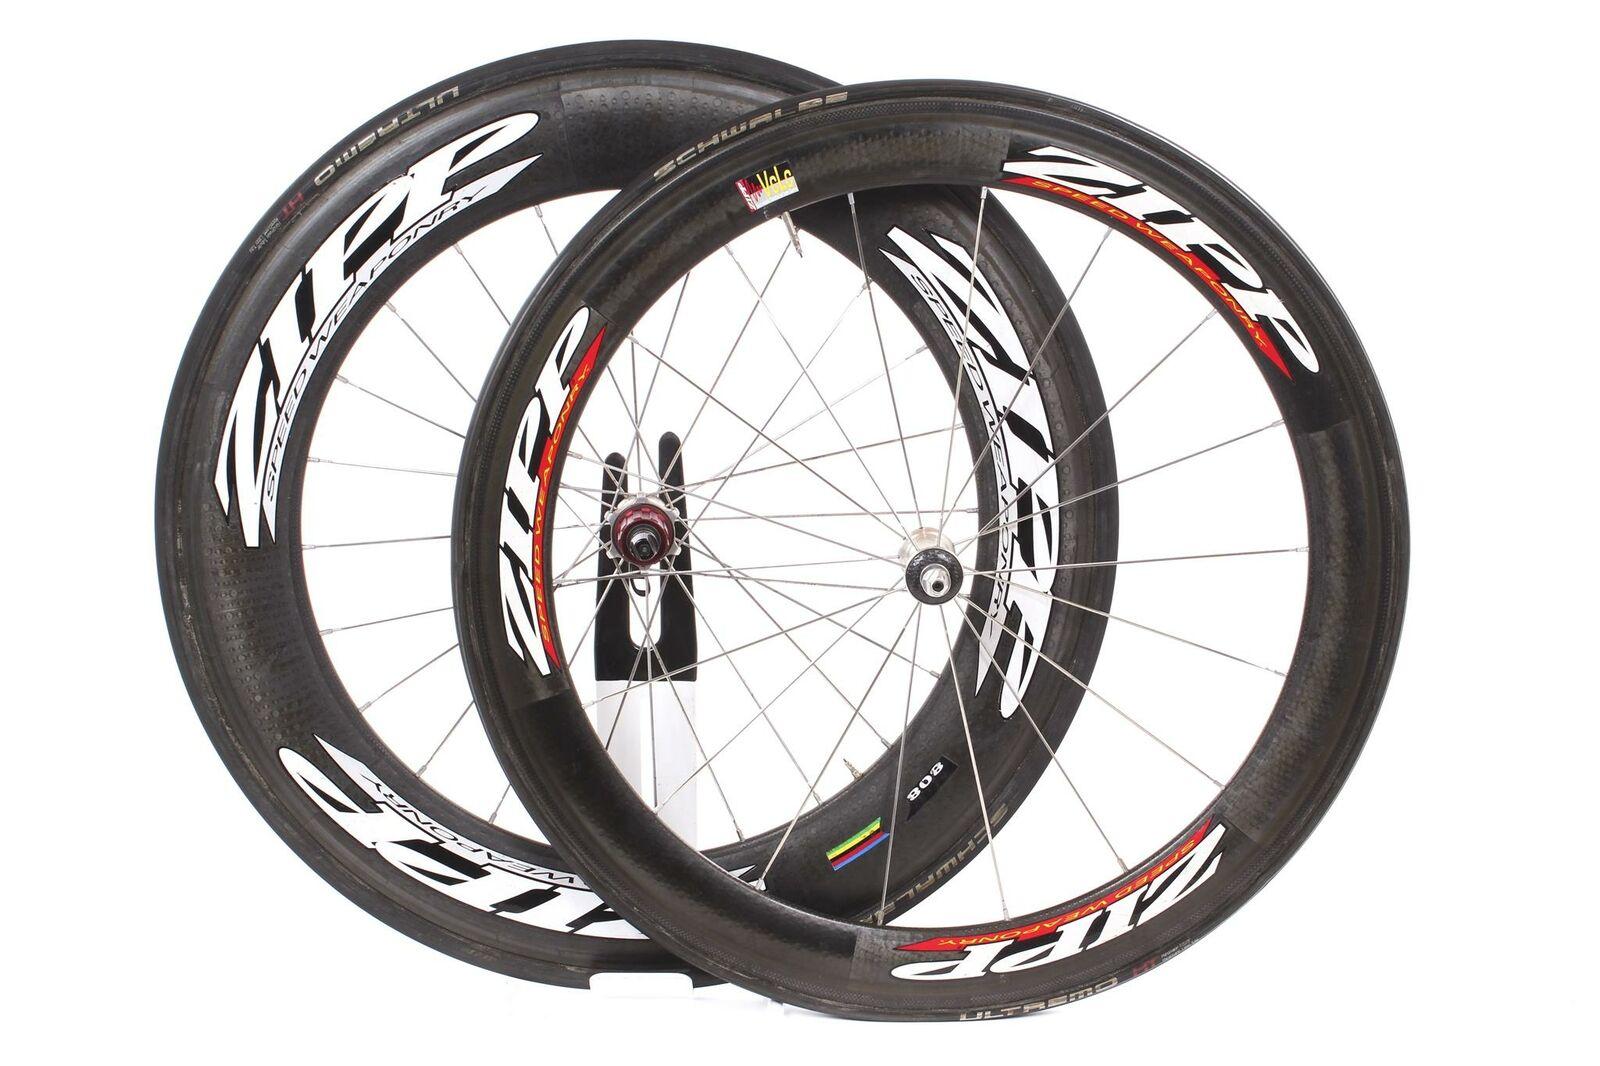 USED Zipp 404  808 700c Carbon Tubular Wheelset 10 Speed Shimano TT Triathlon  the best after-sale service